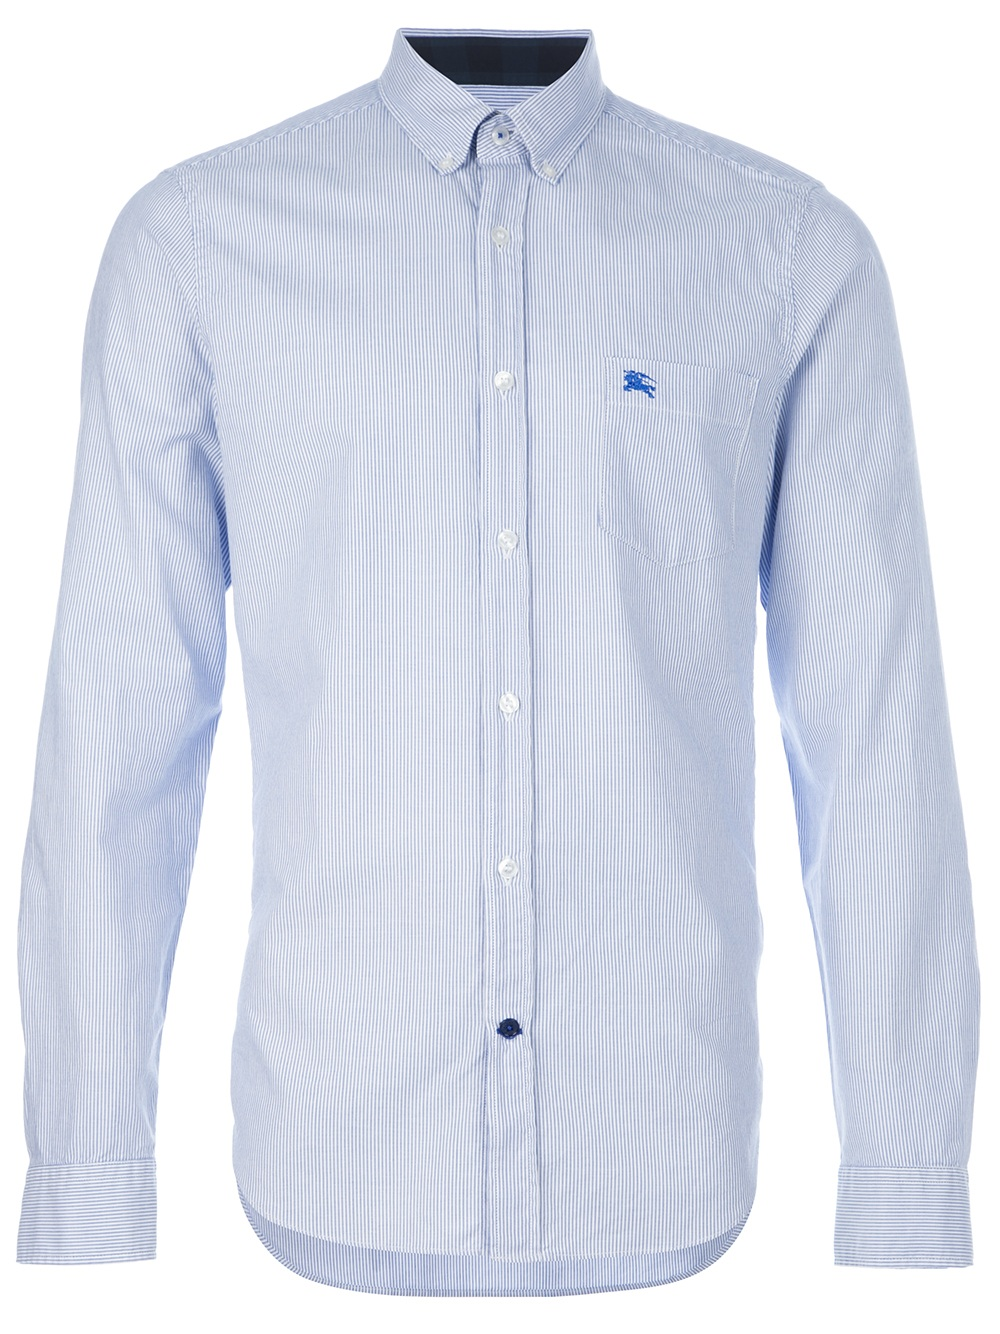 Burberry Brit Button Down Collar Shirt In Blue For Men Lyst